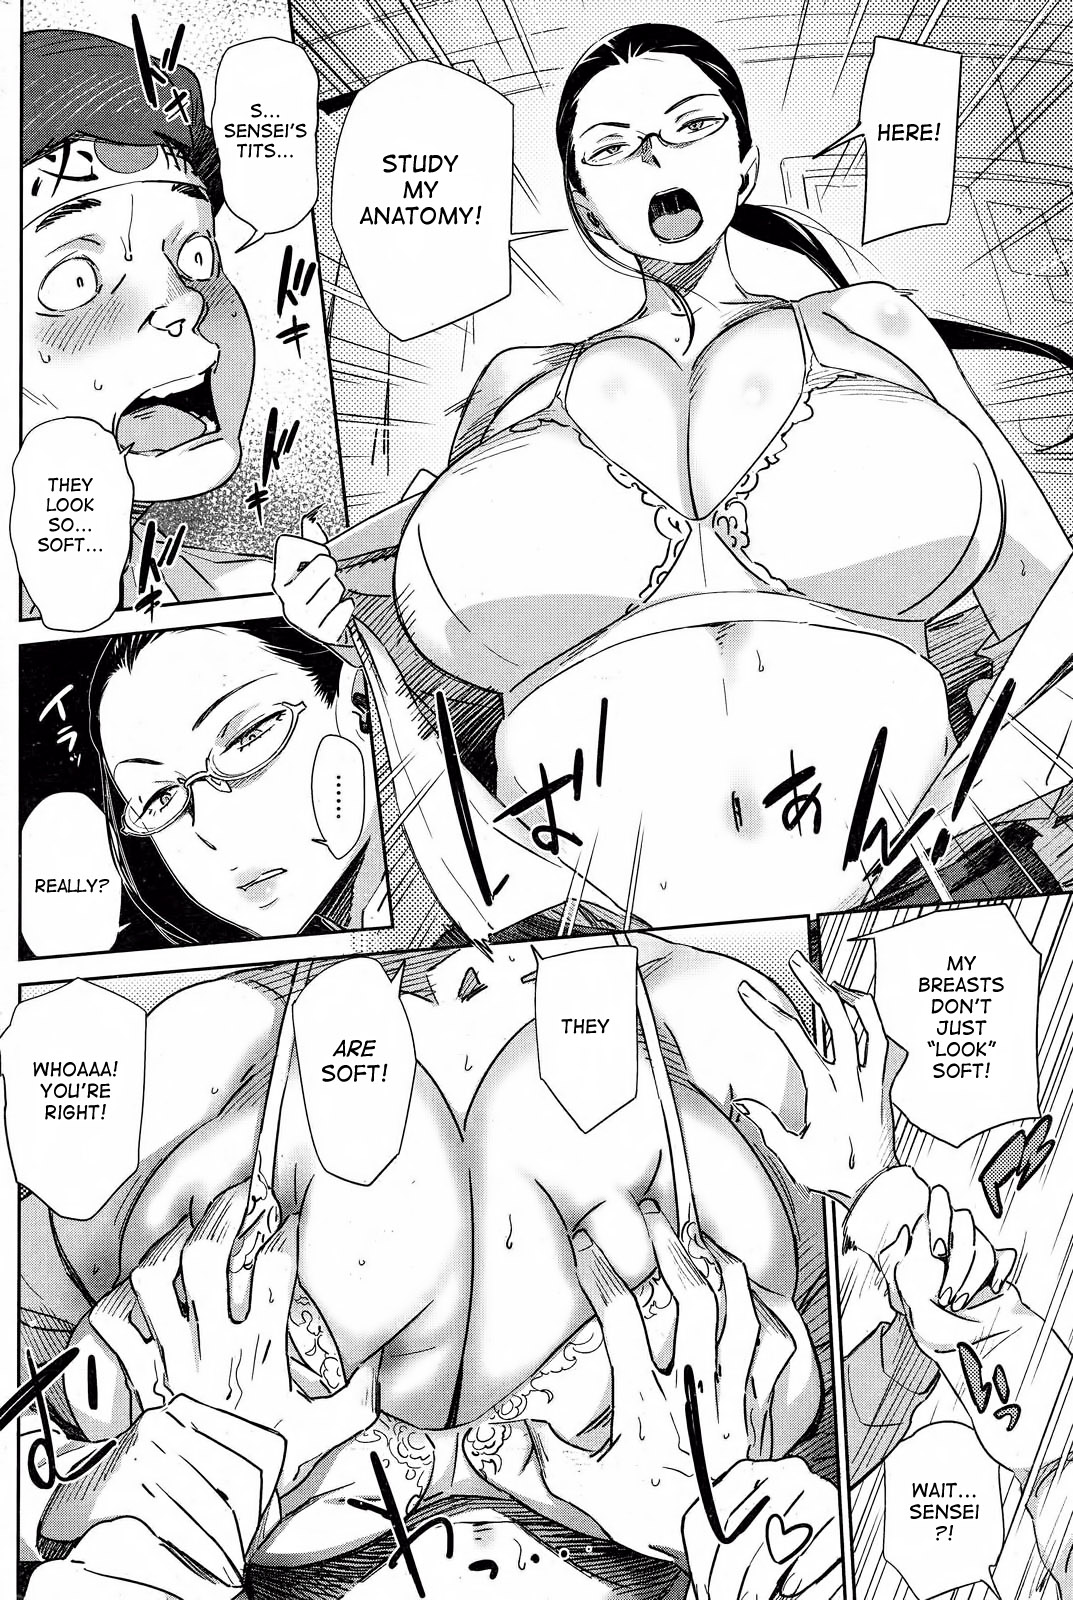 Situation familiar sex anatomy hentai please the